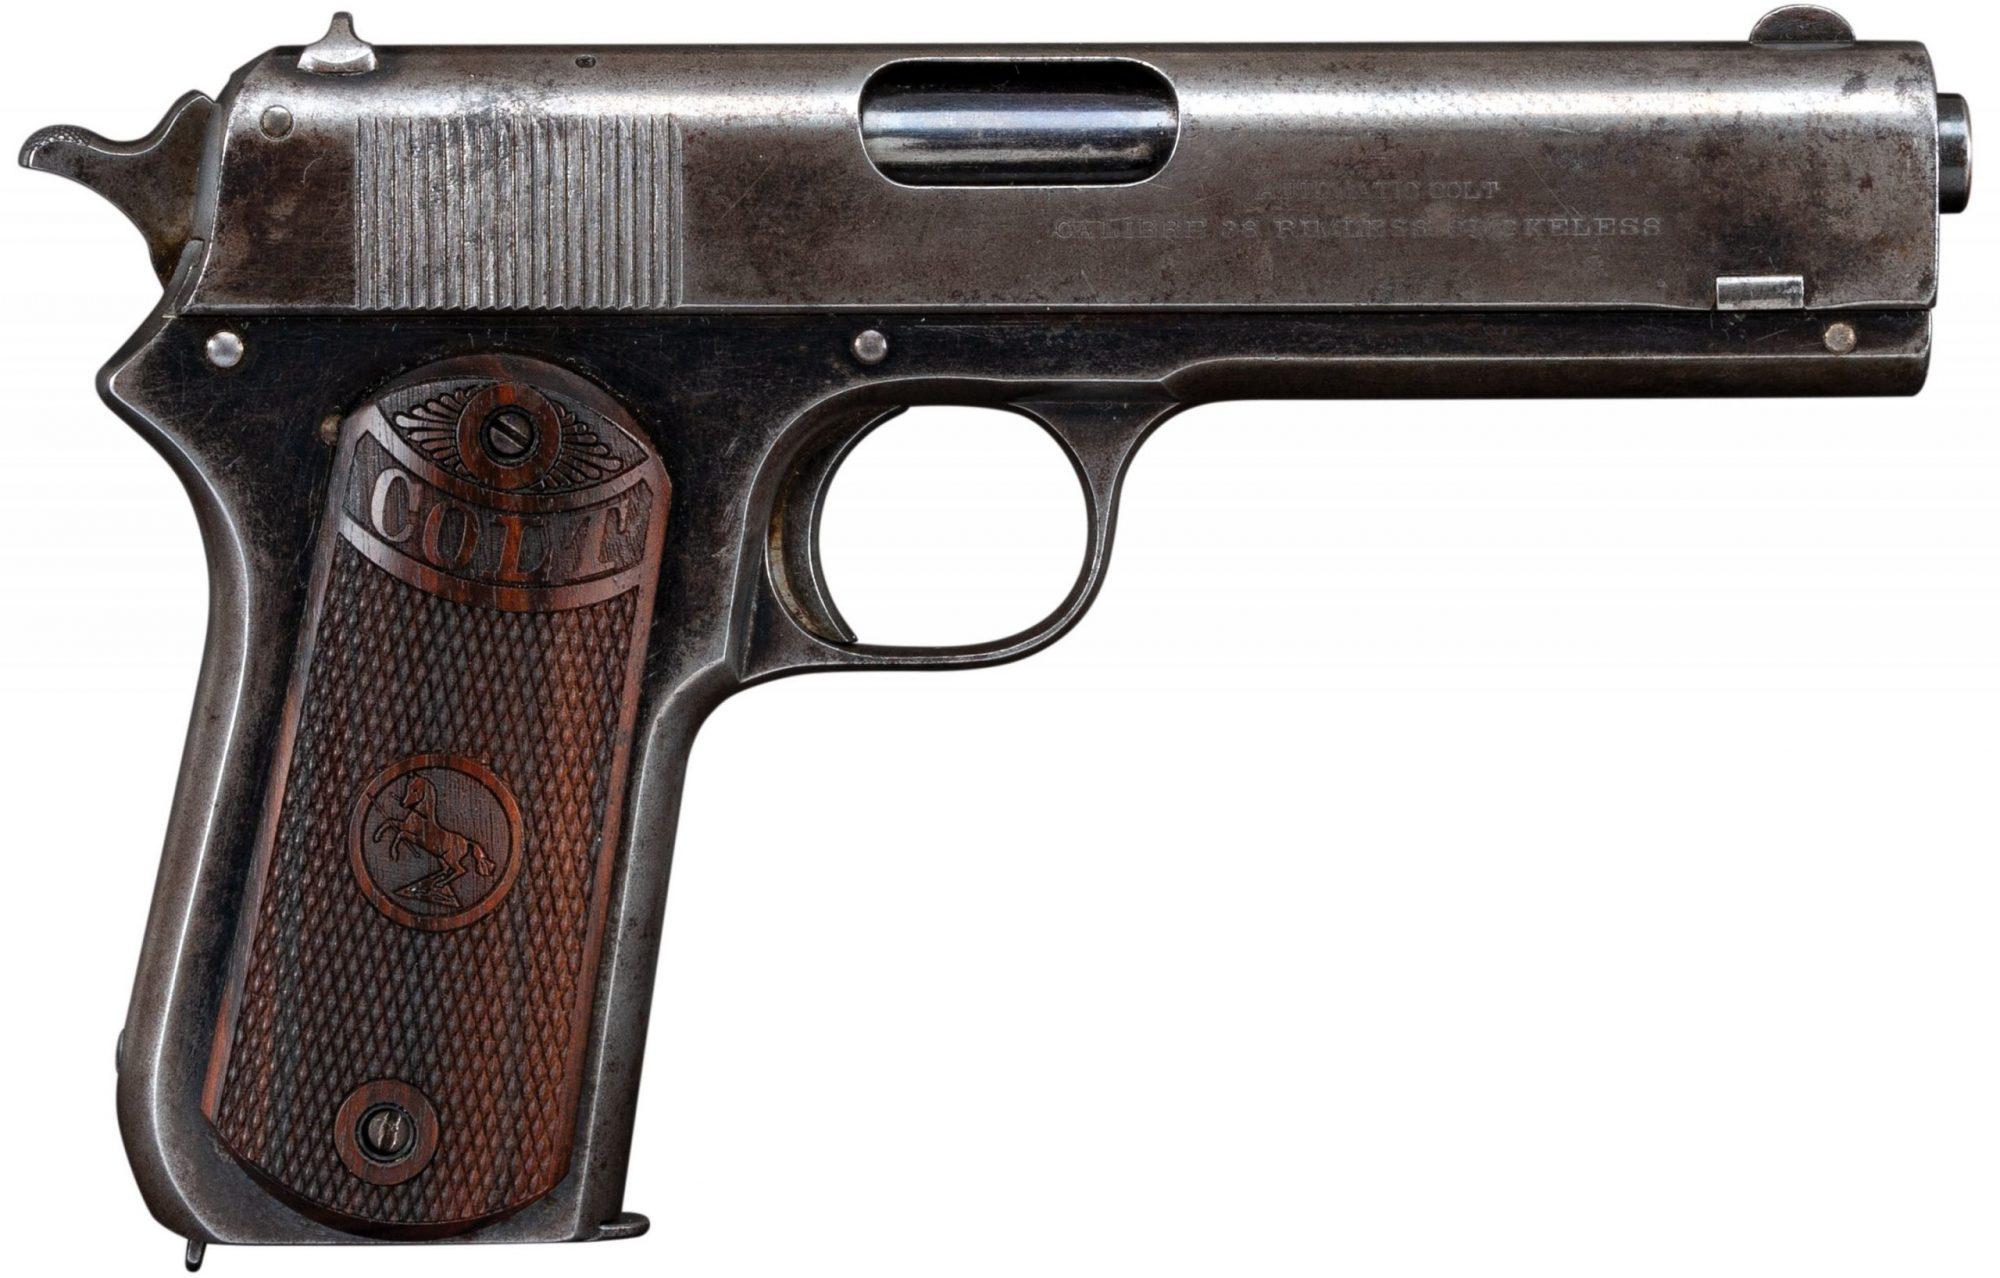 Photo of a Colt Model 1903 Pocket Hammer before restoration by Turnbull Restoration of Bloomfield, NY